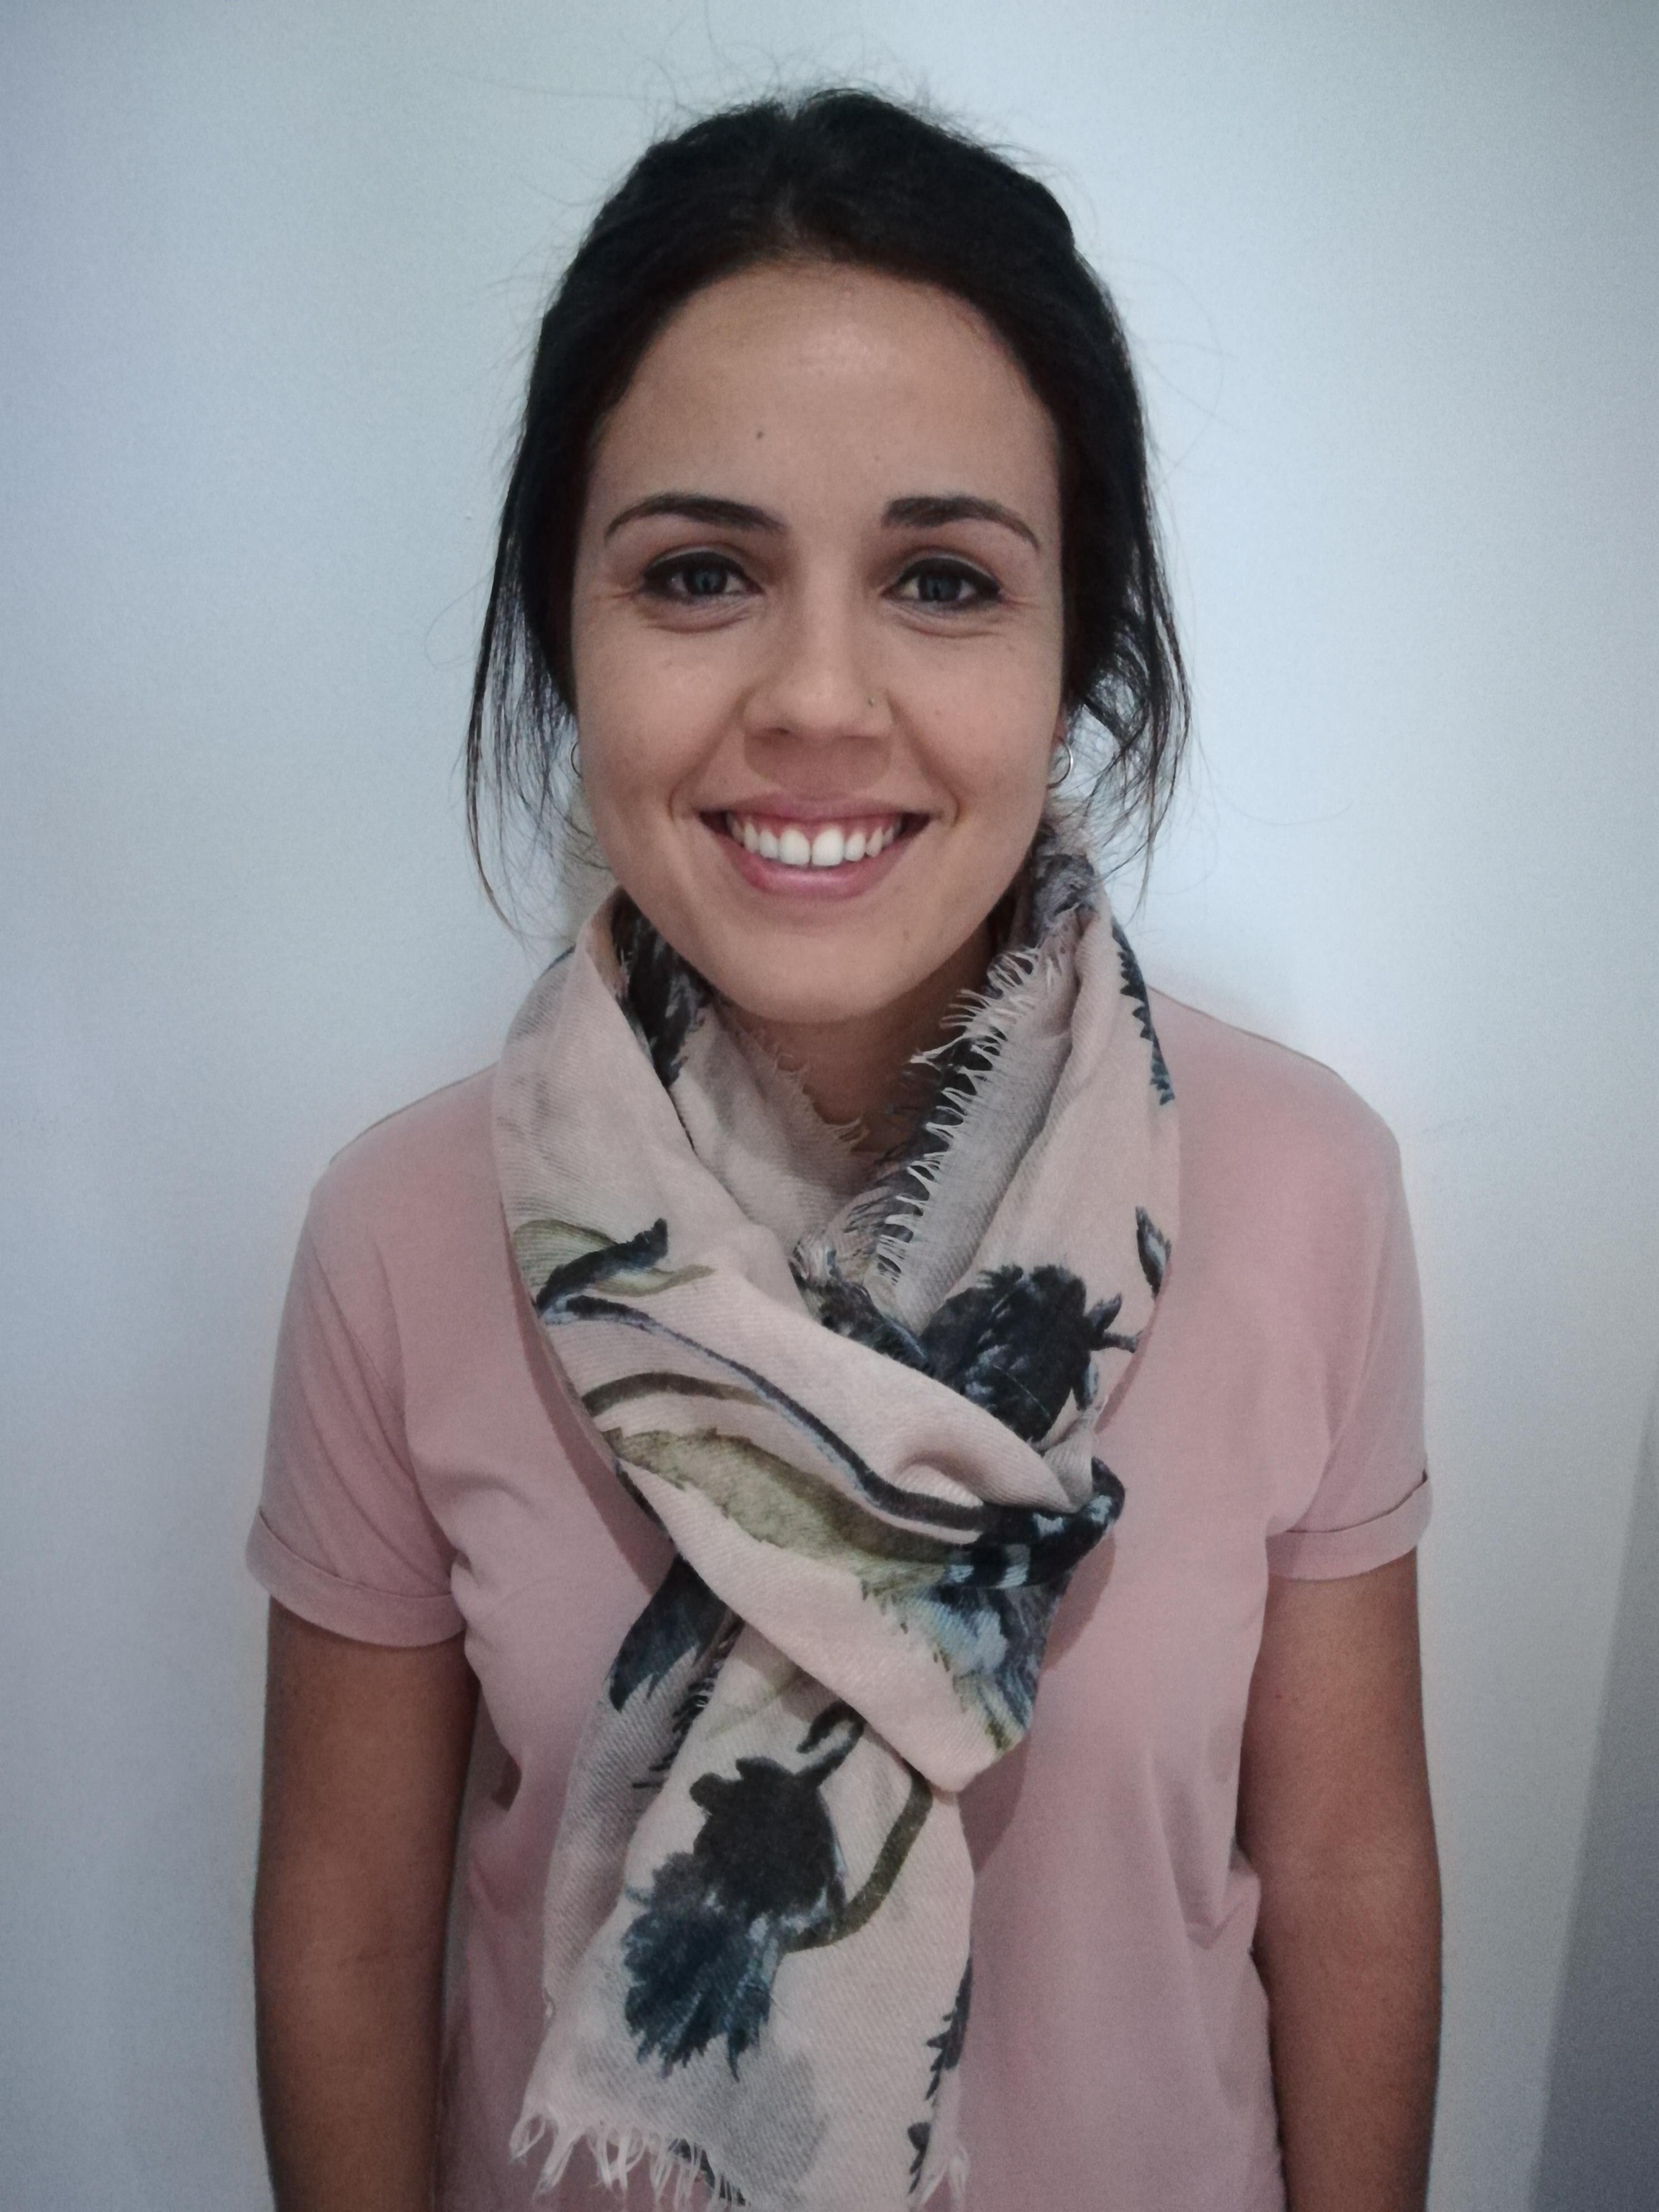 Maria Soledad Hernández Betancort